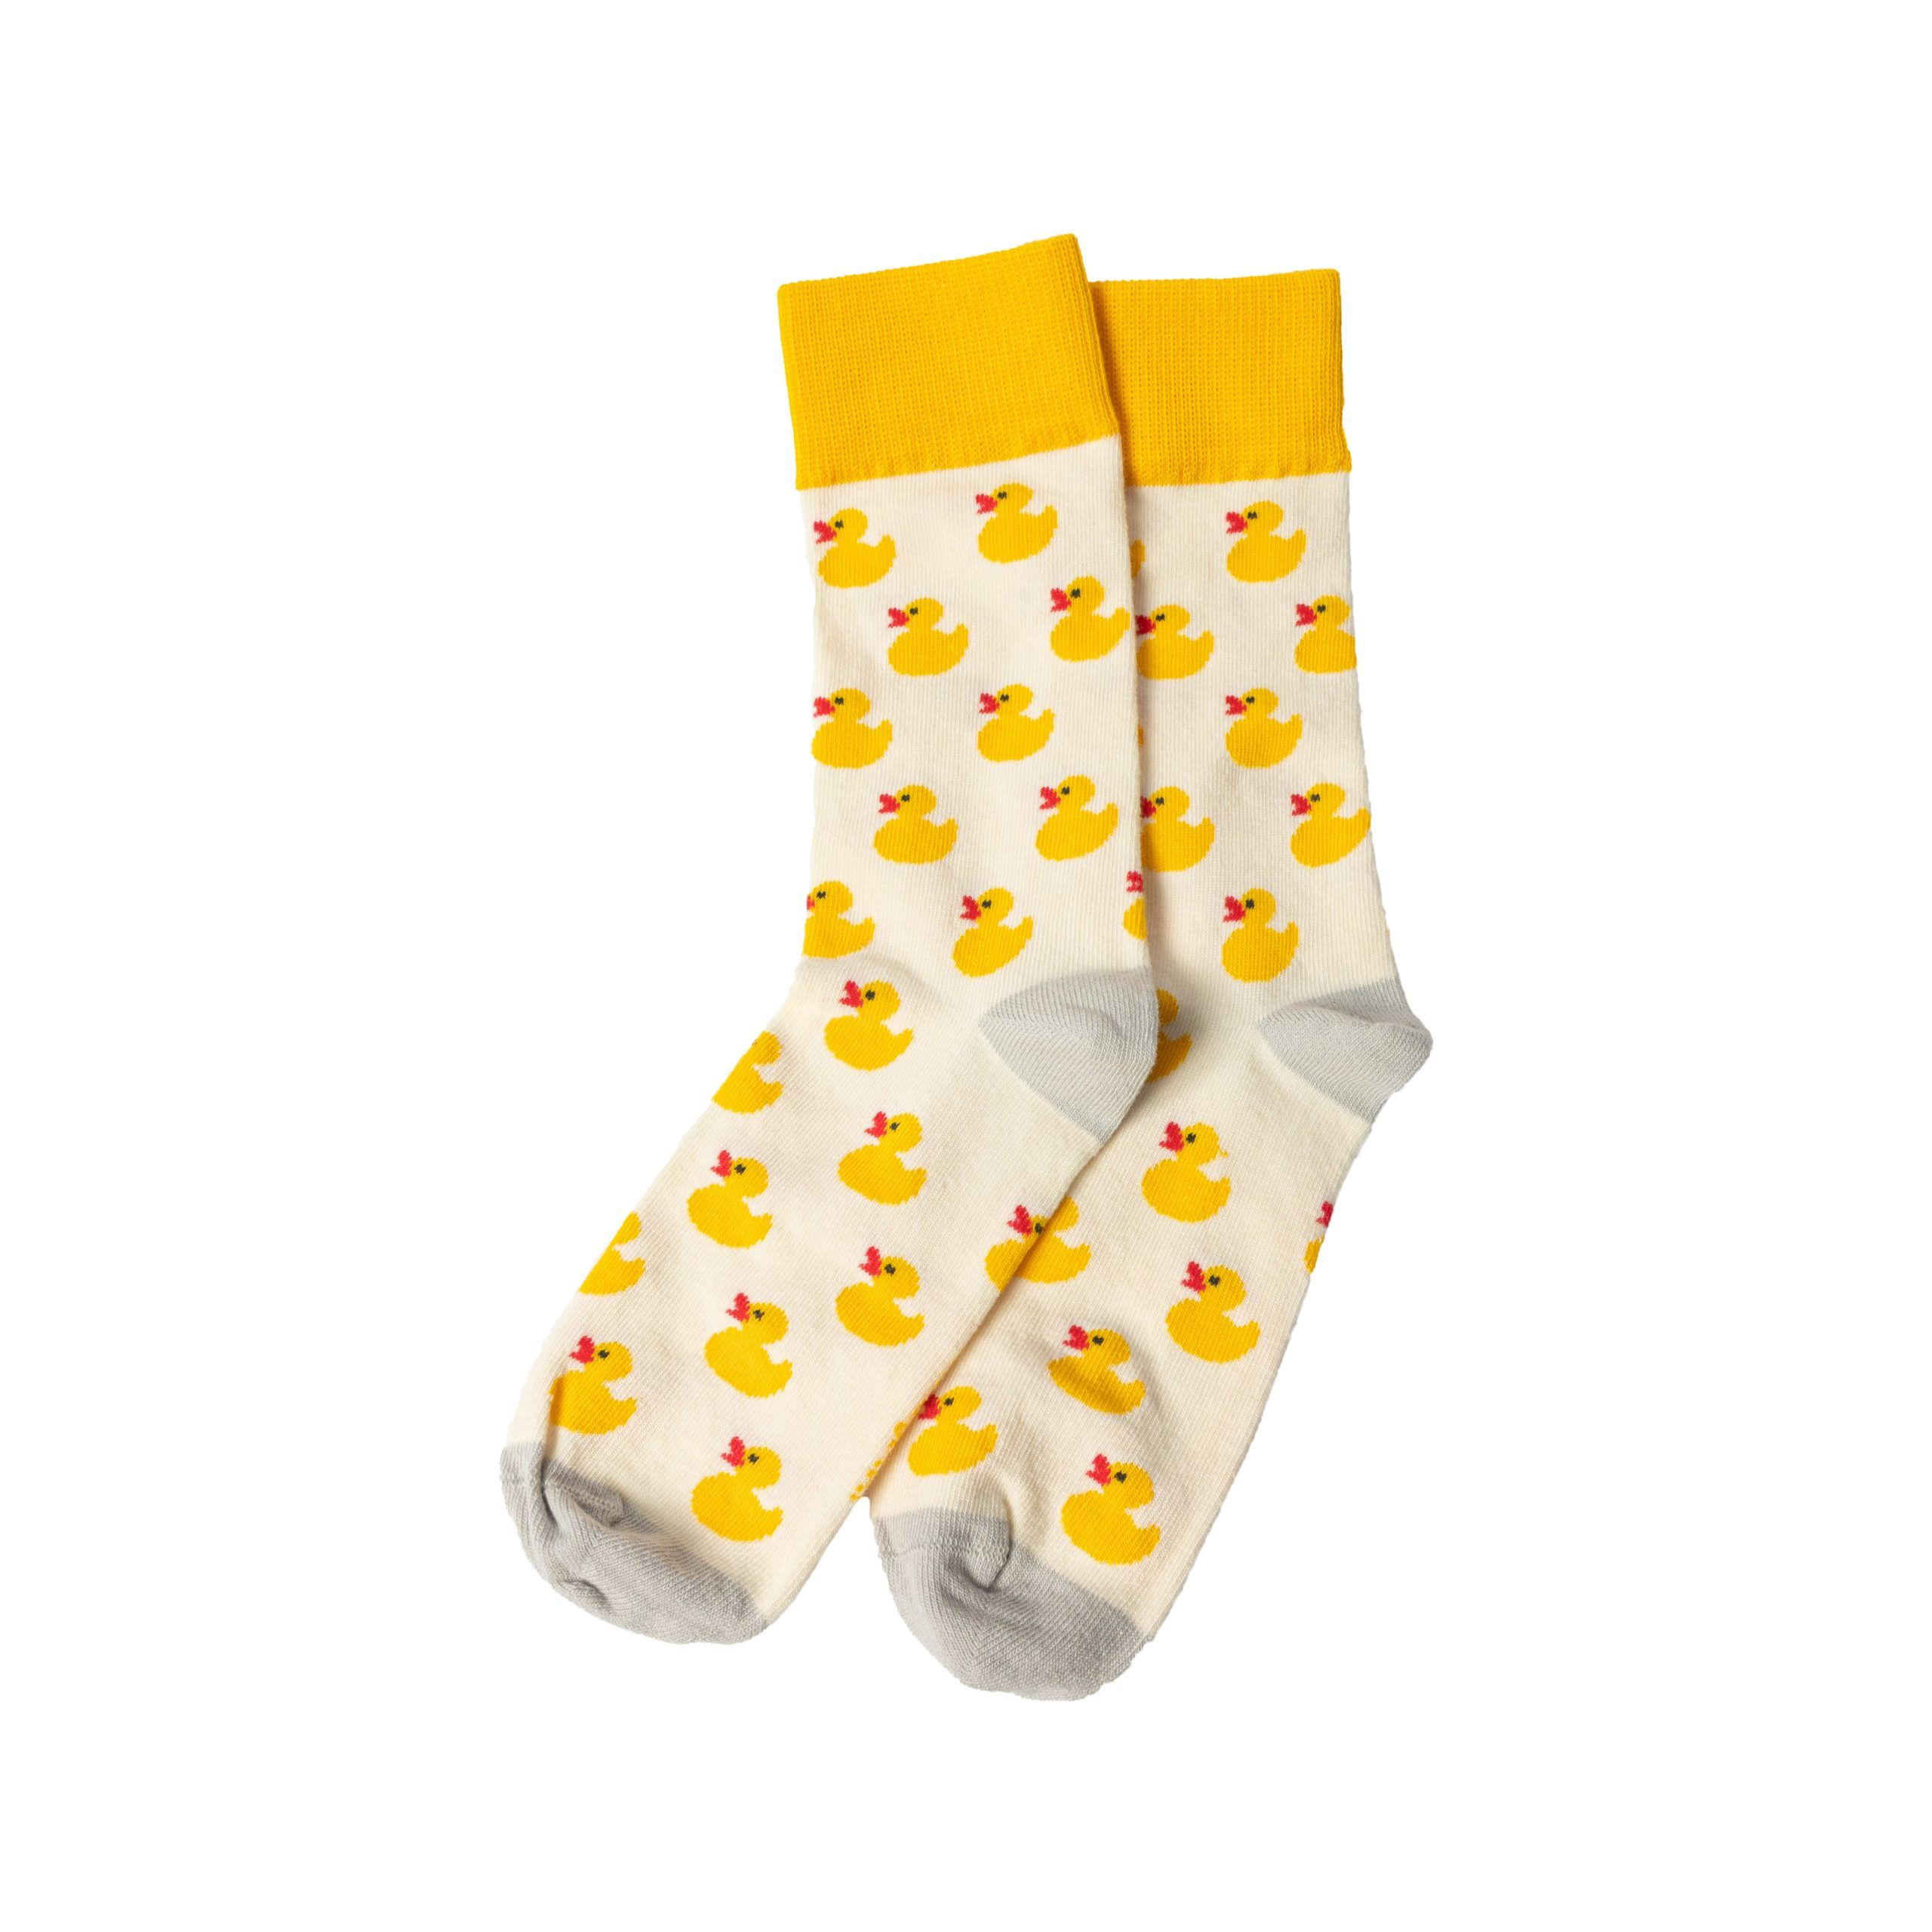 Duck You Yellow and cream socks